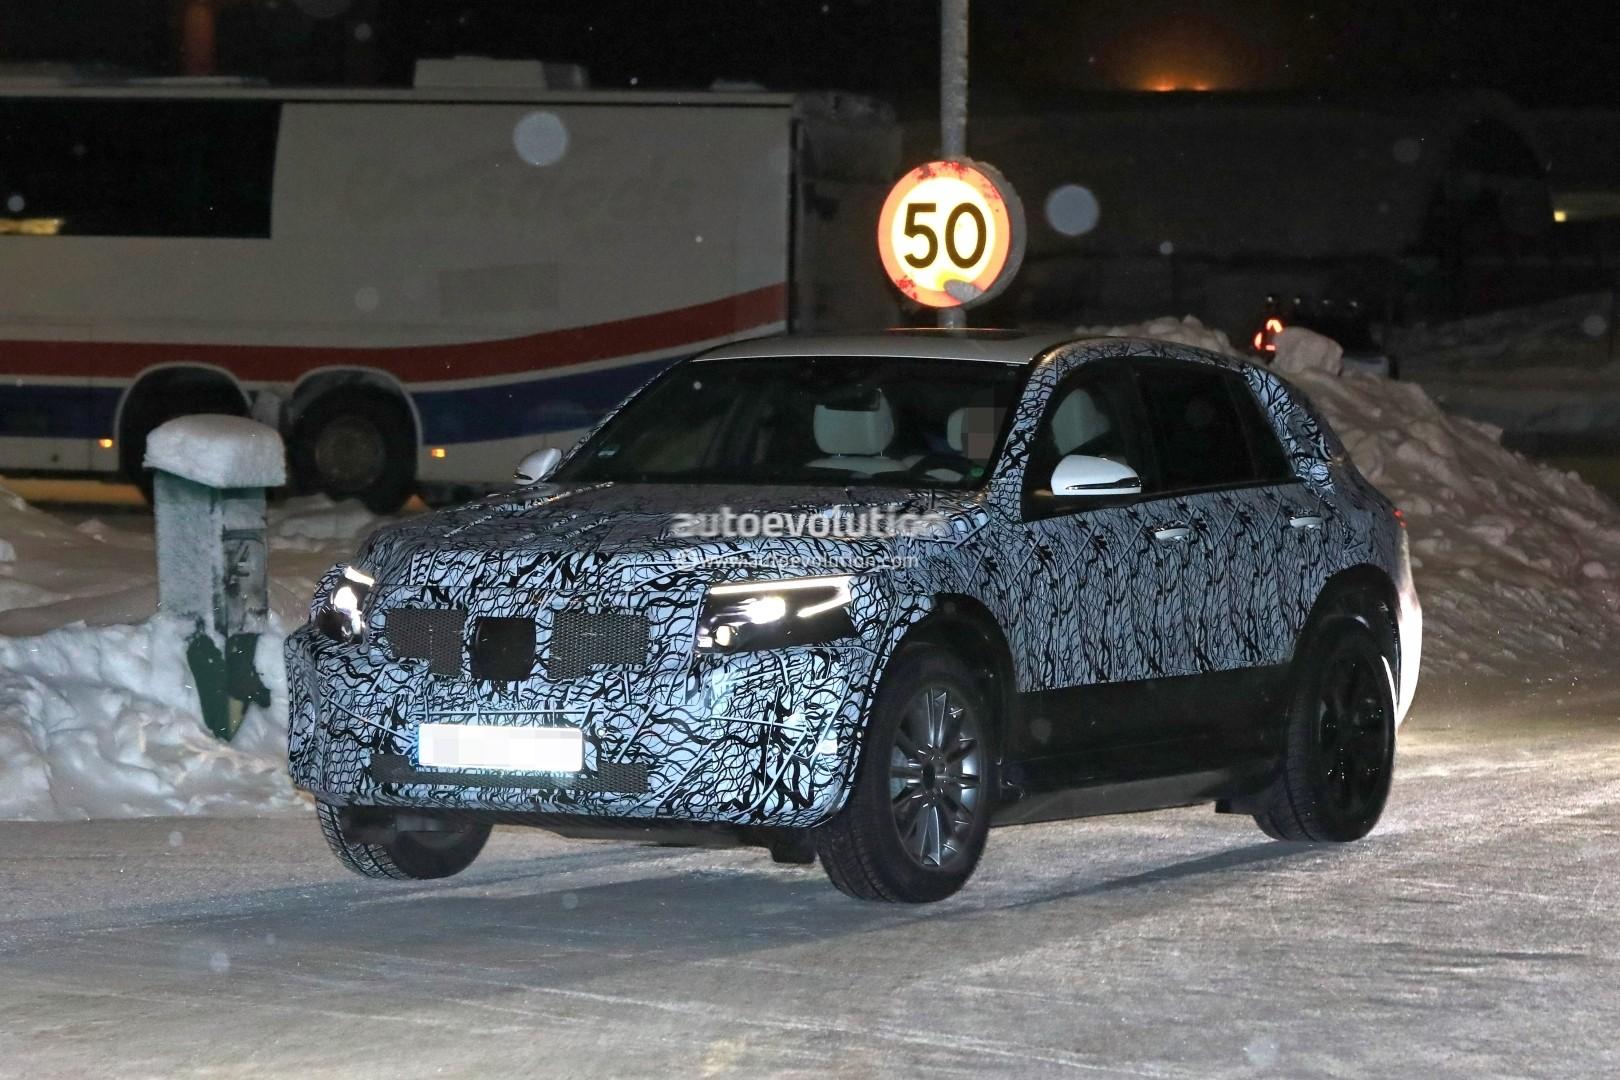 Mercedes Camper Van >> 2020 Mercedes-Benz EQC Electric SUV Makes Spyshot Debut, Prototype Looks Sleek - autoevolution